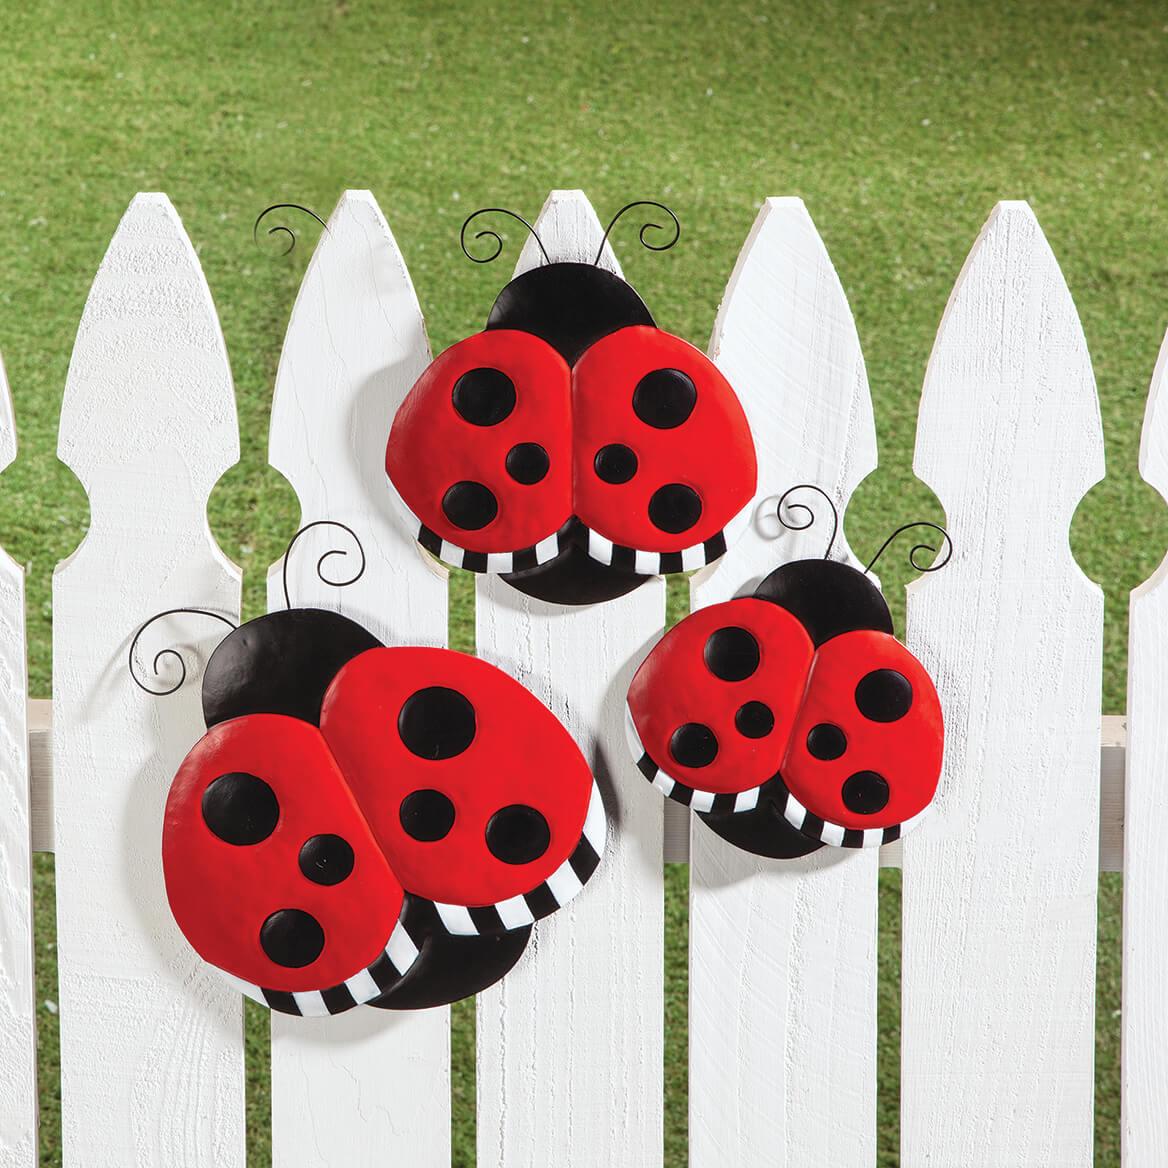 Metal Ladybug Hangers, Set of 3 by Fox River™ Creations-369031